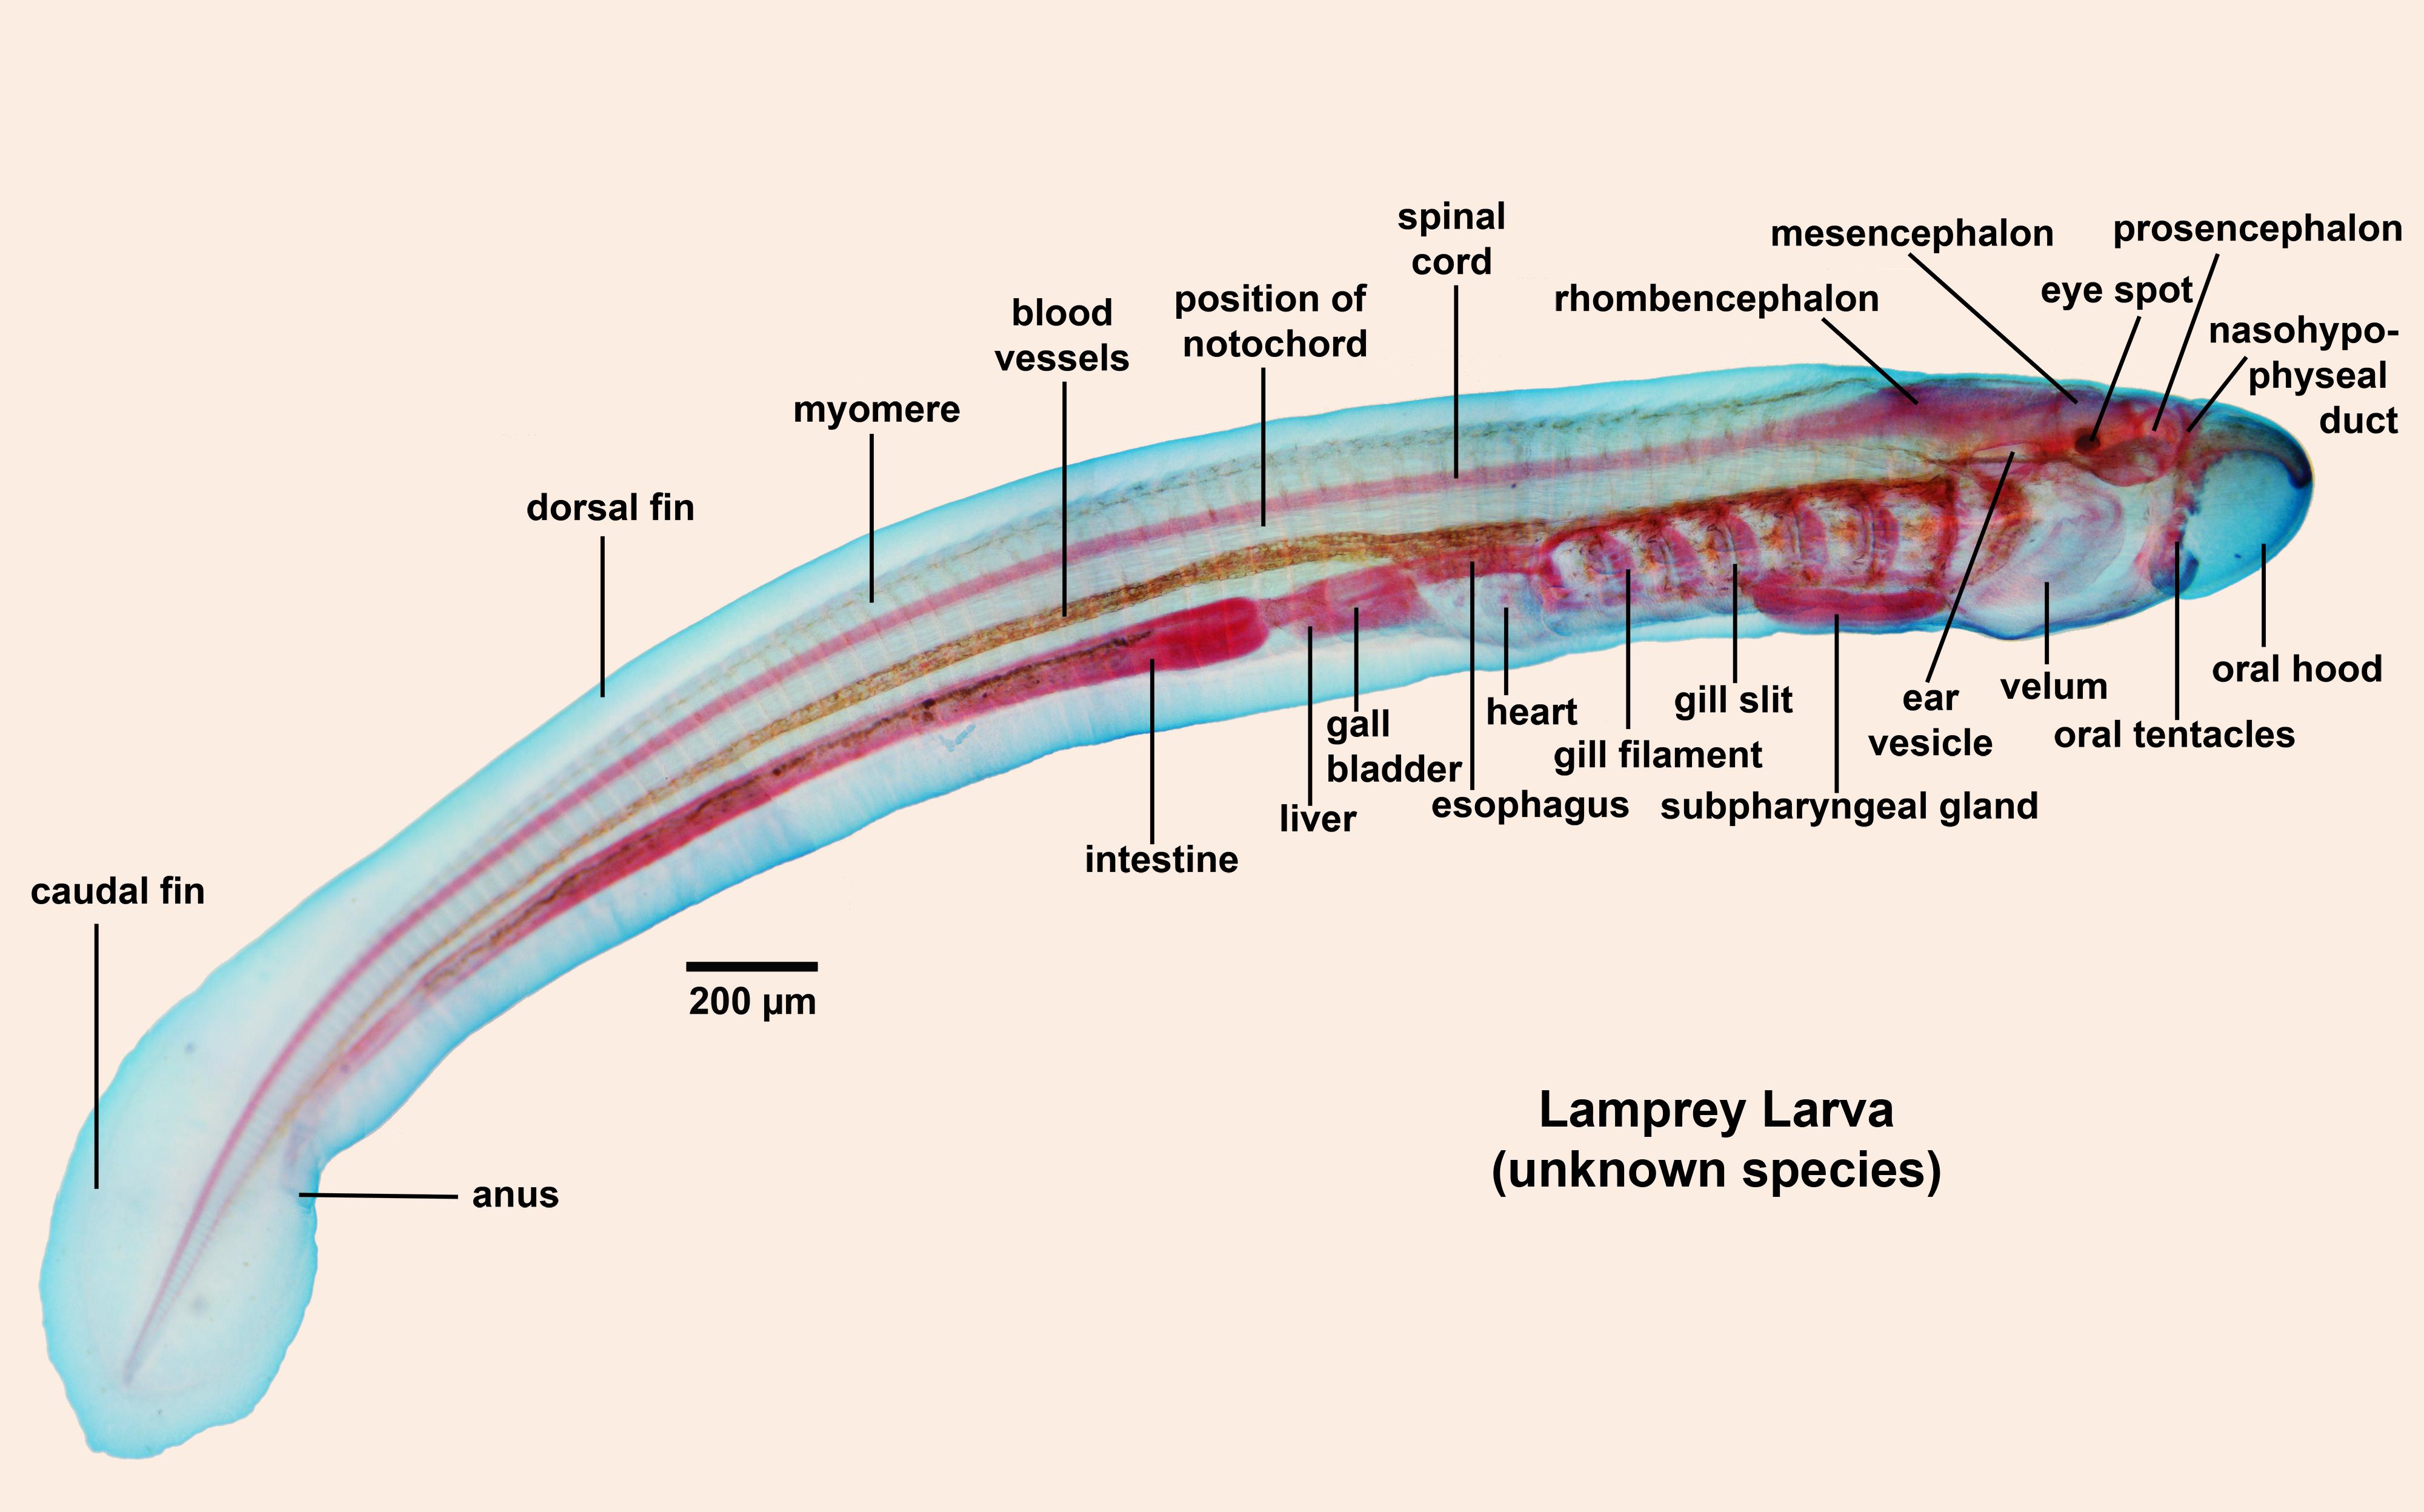 Anatomy of lamprey